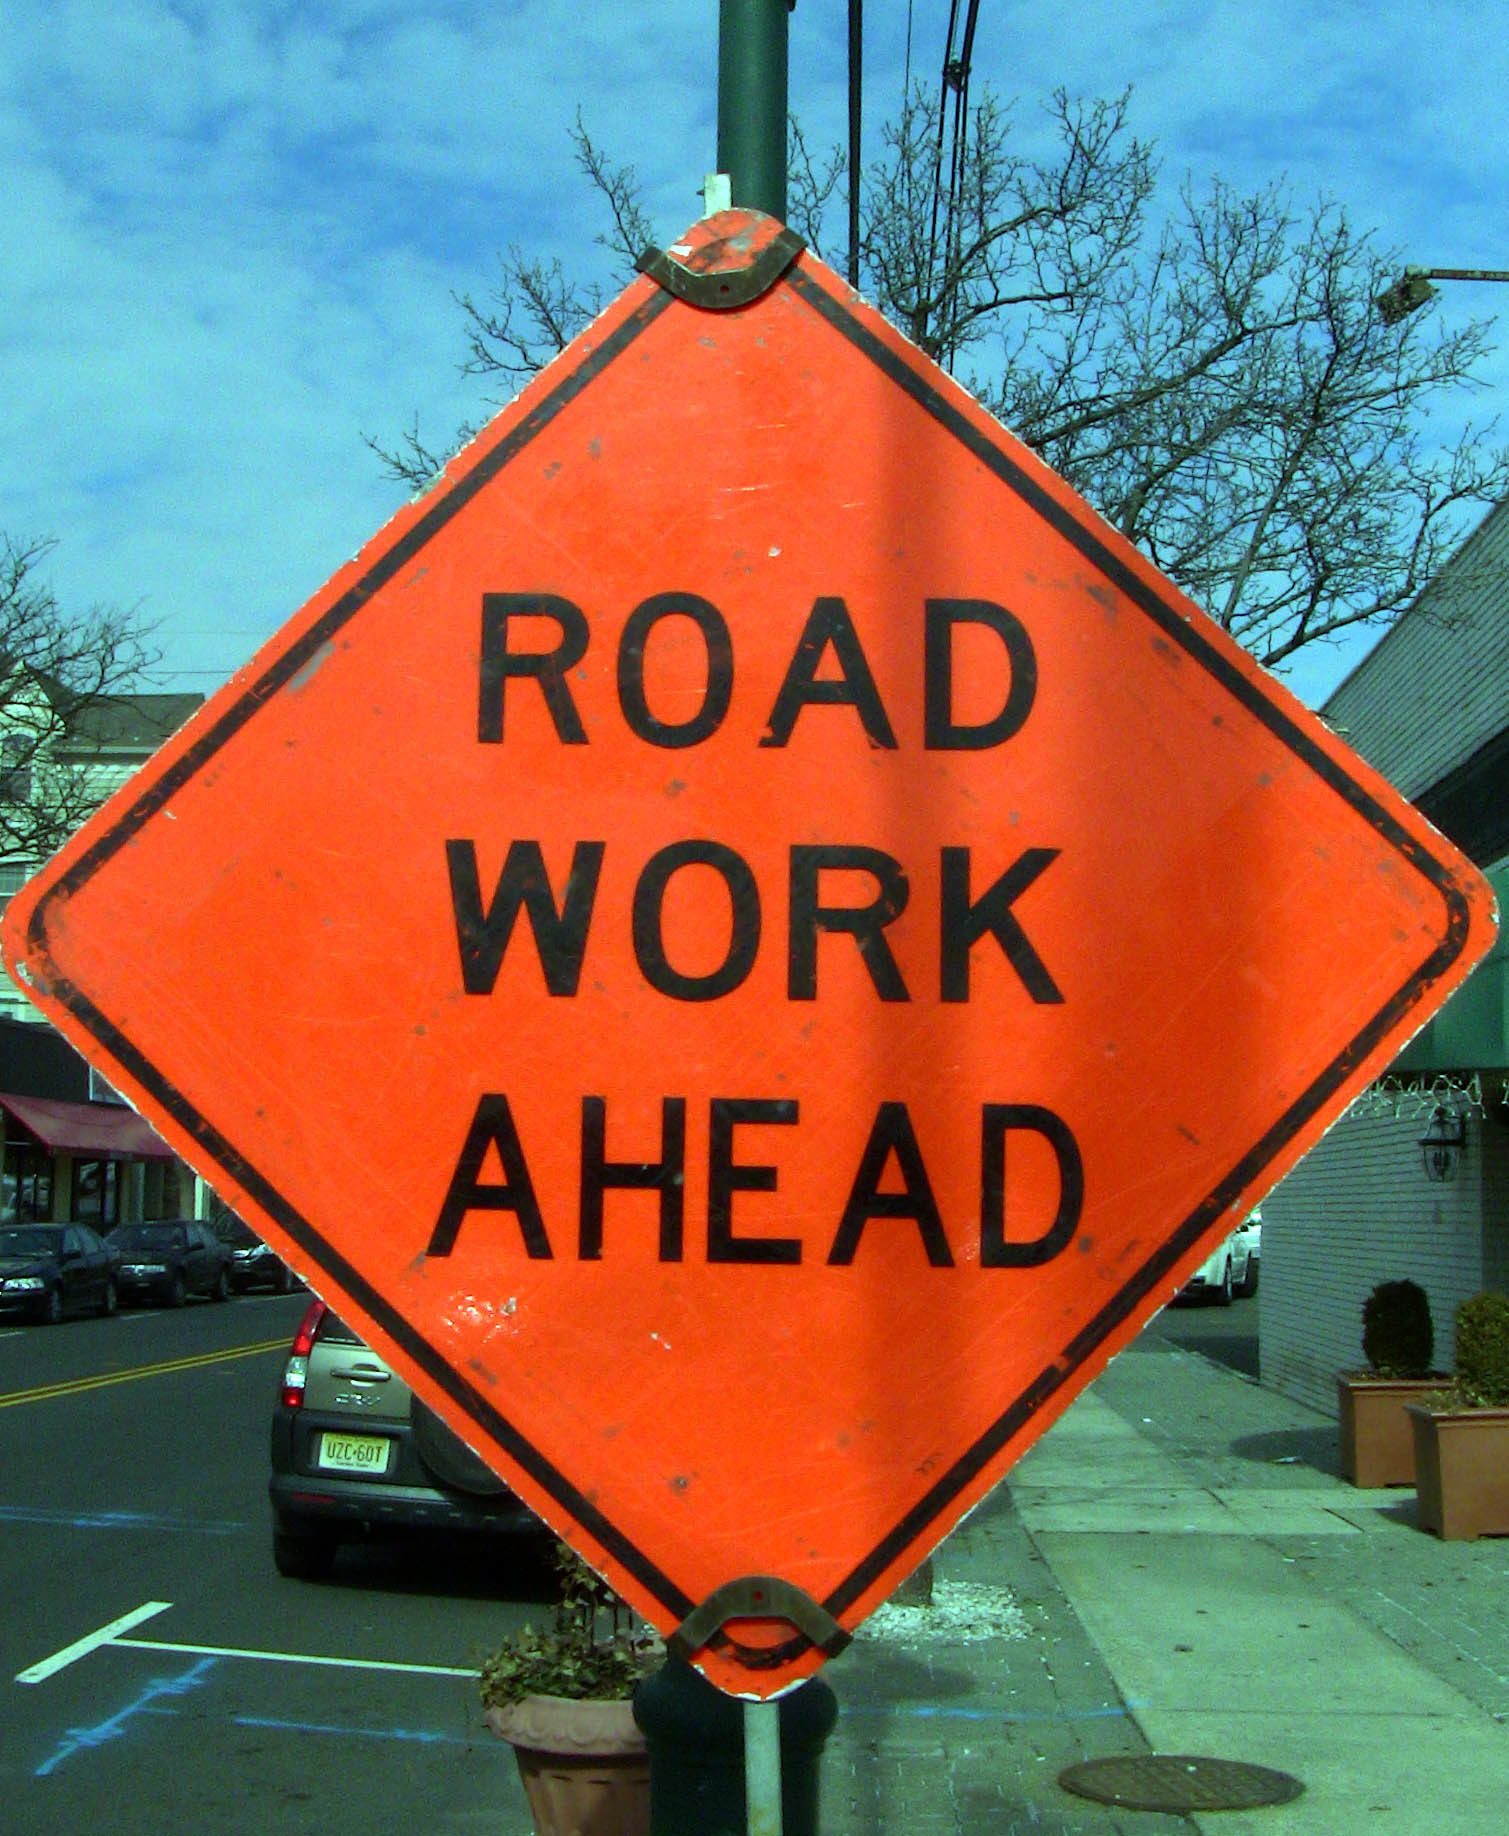 c69992c718a4a9fa50e6_Road_Work_Ahead_sign.jpg